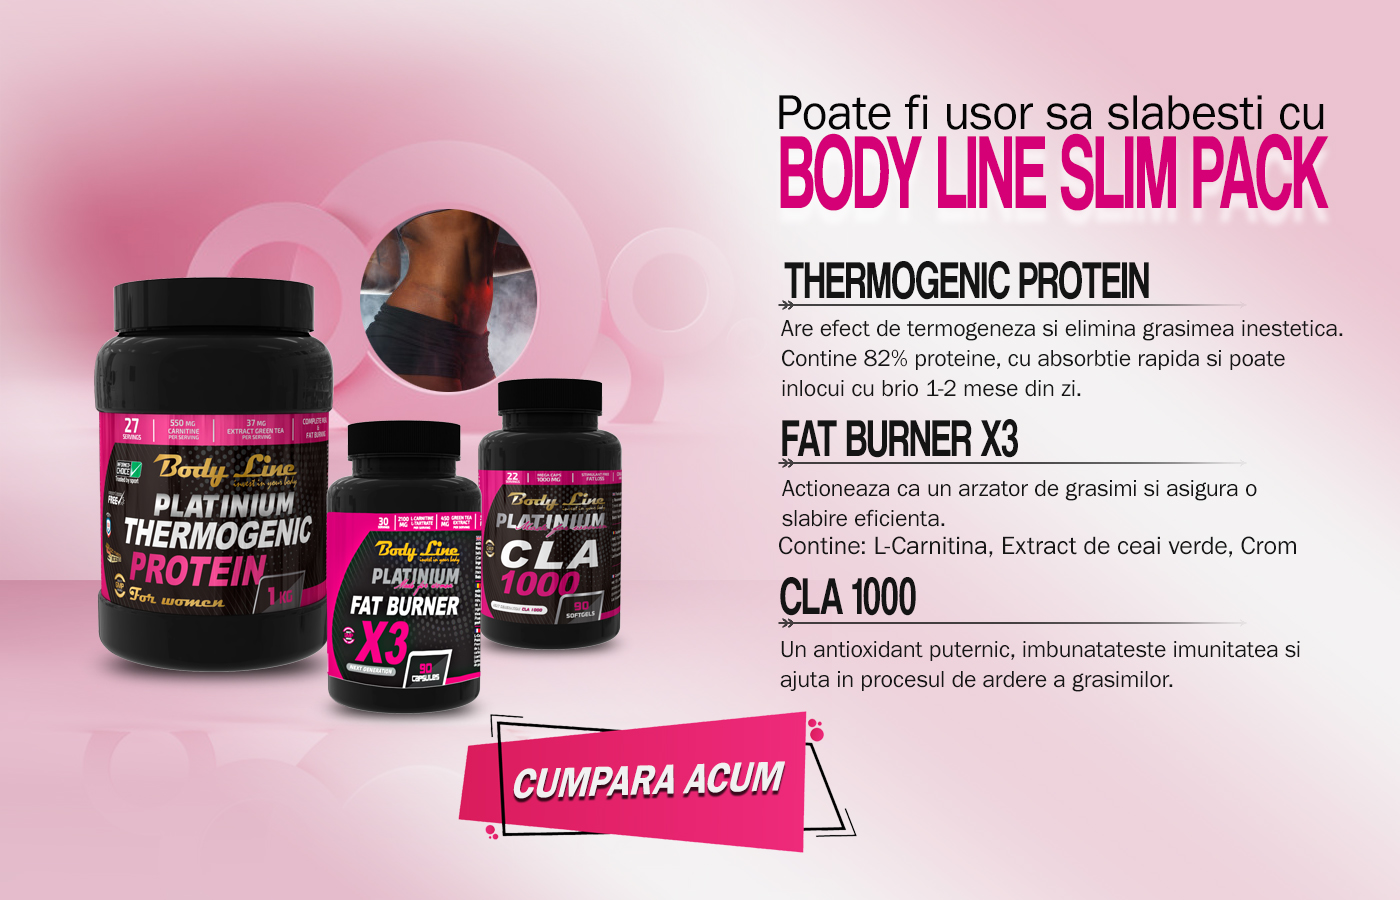 body line slim pack - slăbire eficientă